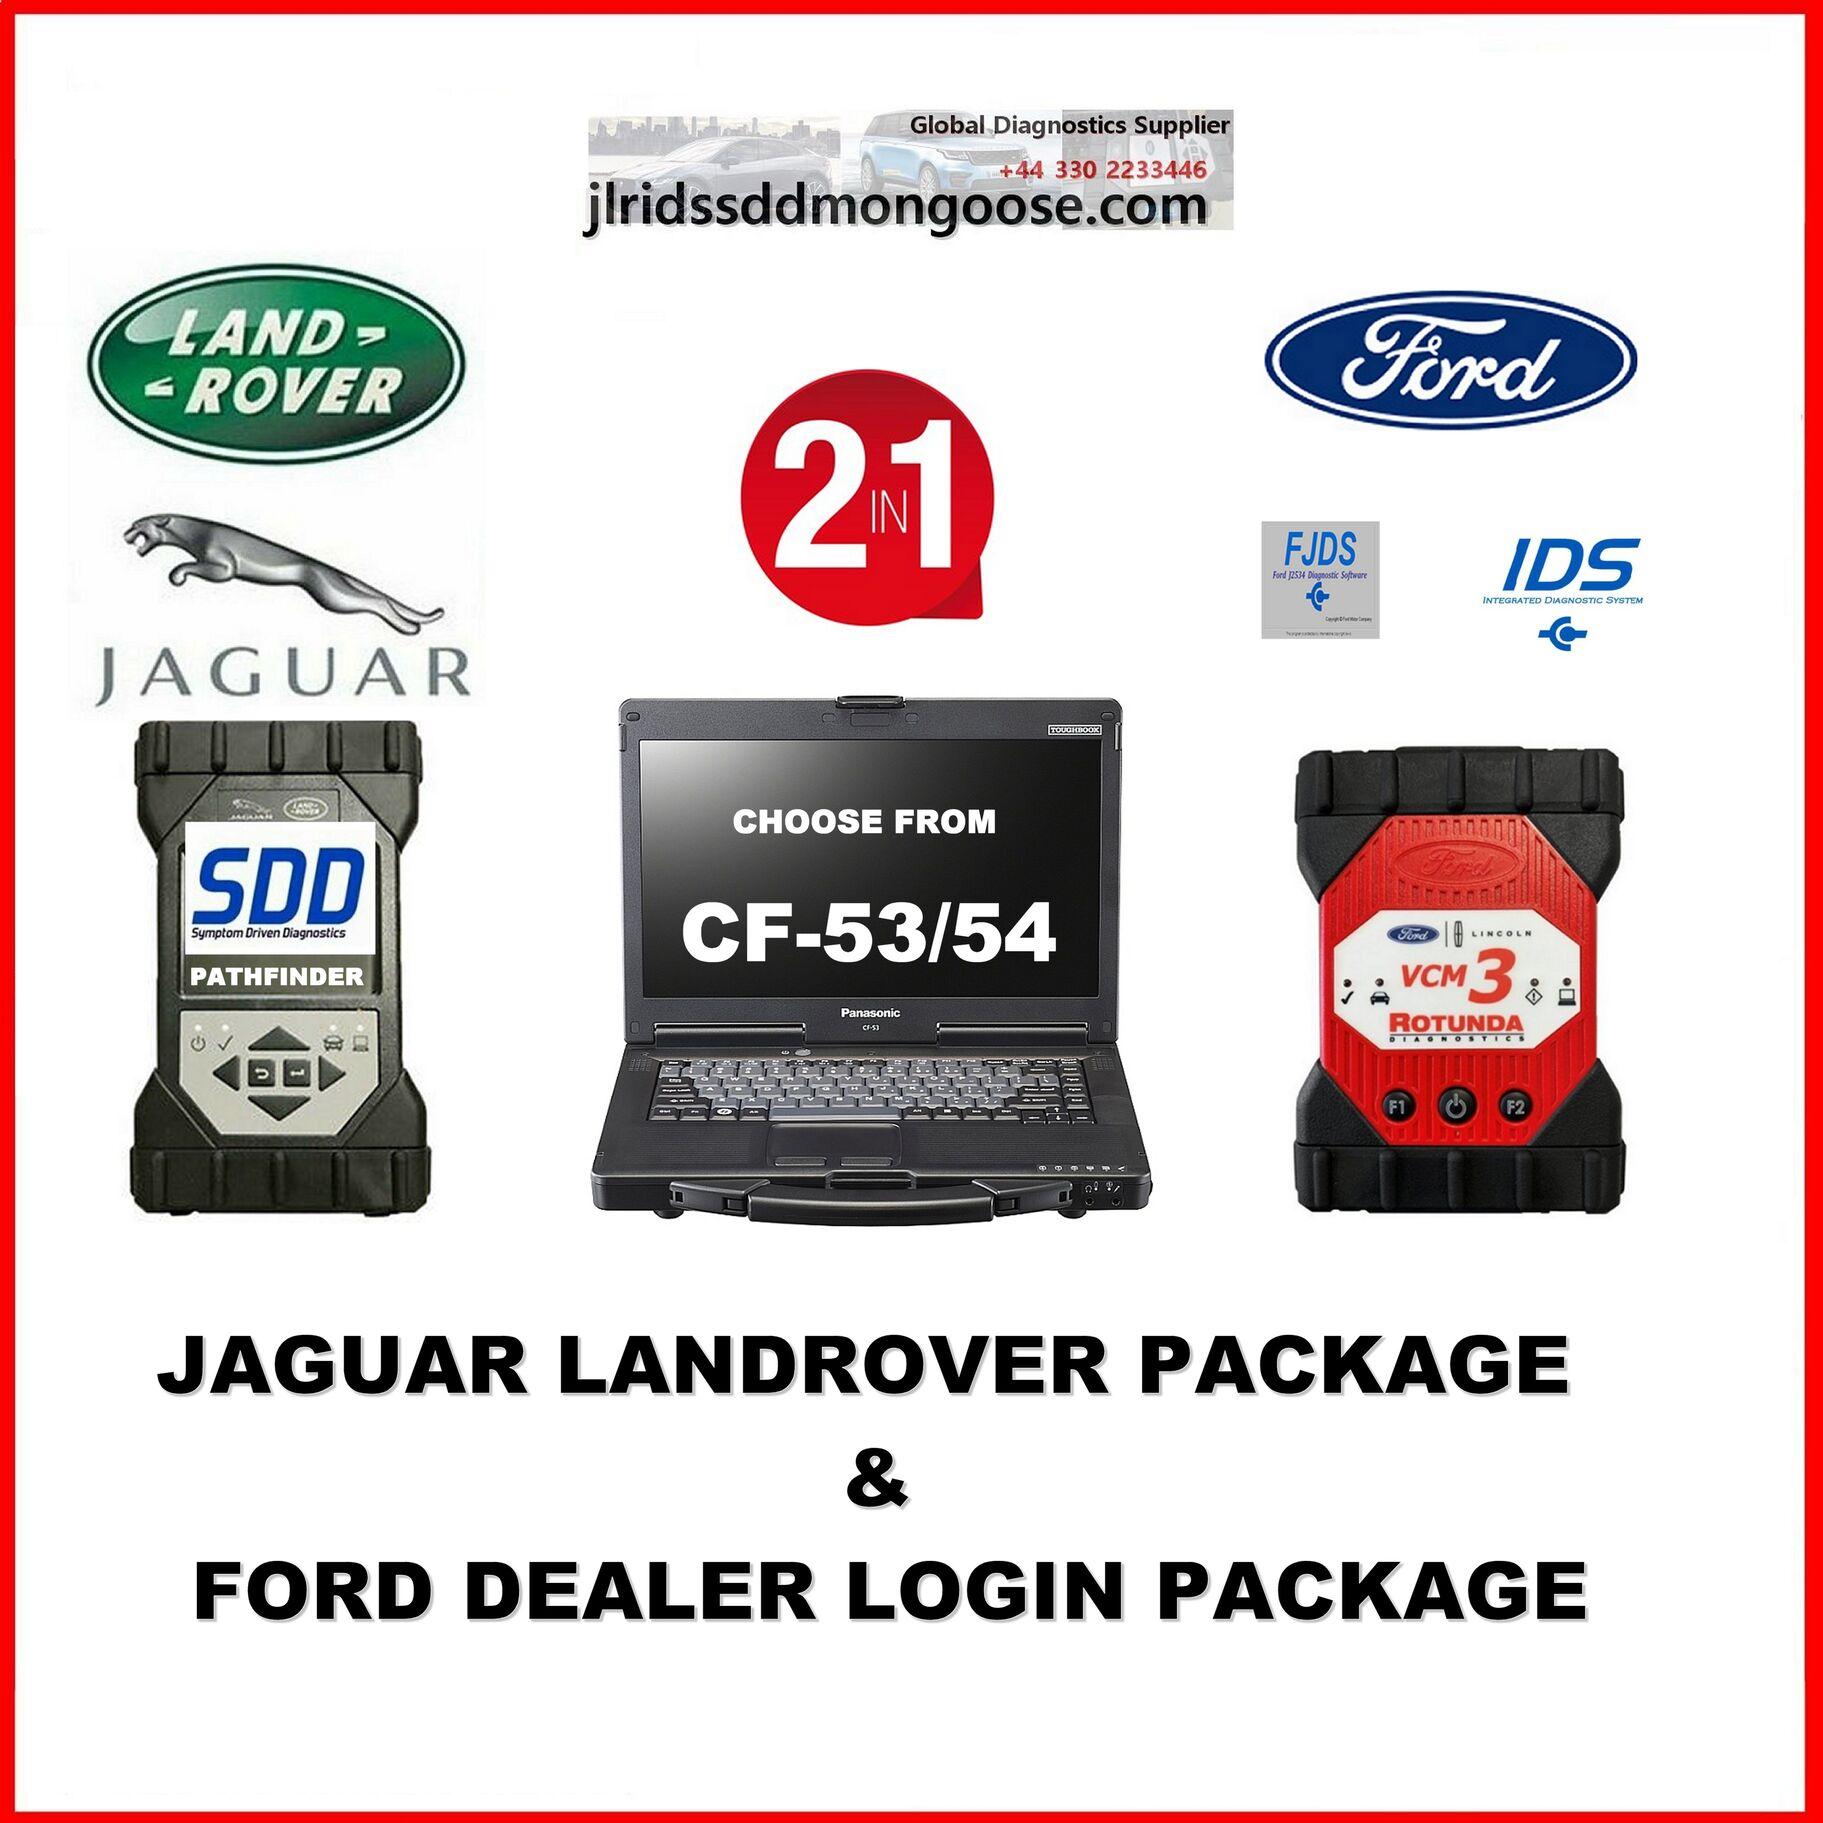 Jaguar Land Rover Package & Ford Dealer Login Package 2 in 1 Package